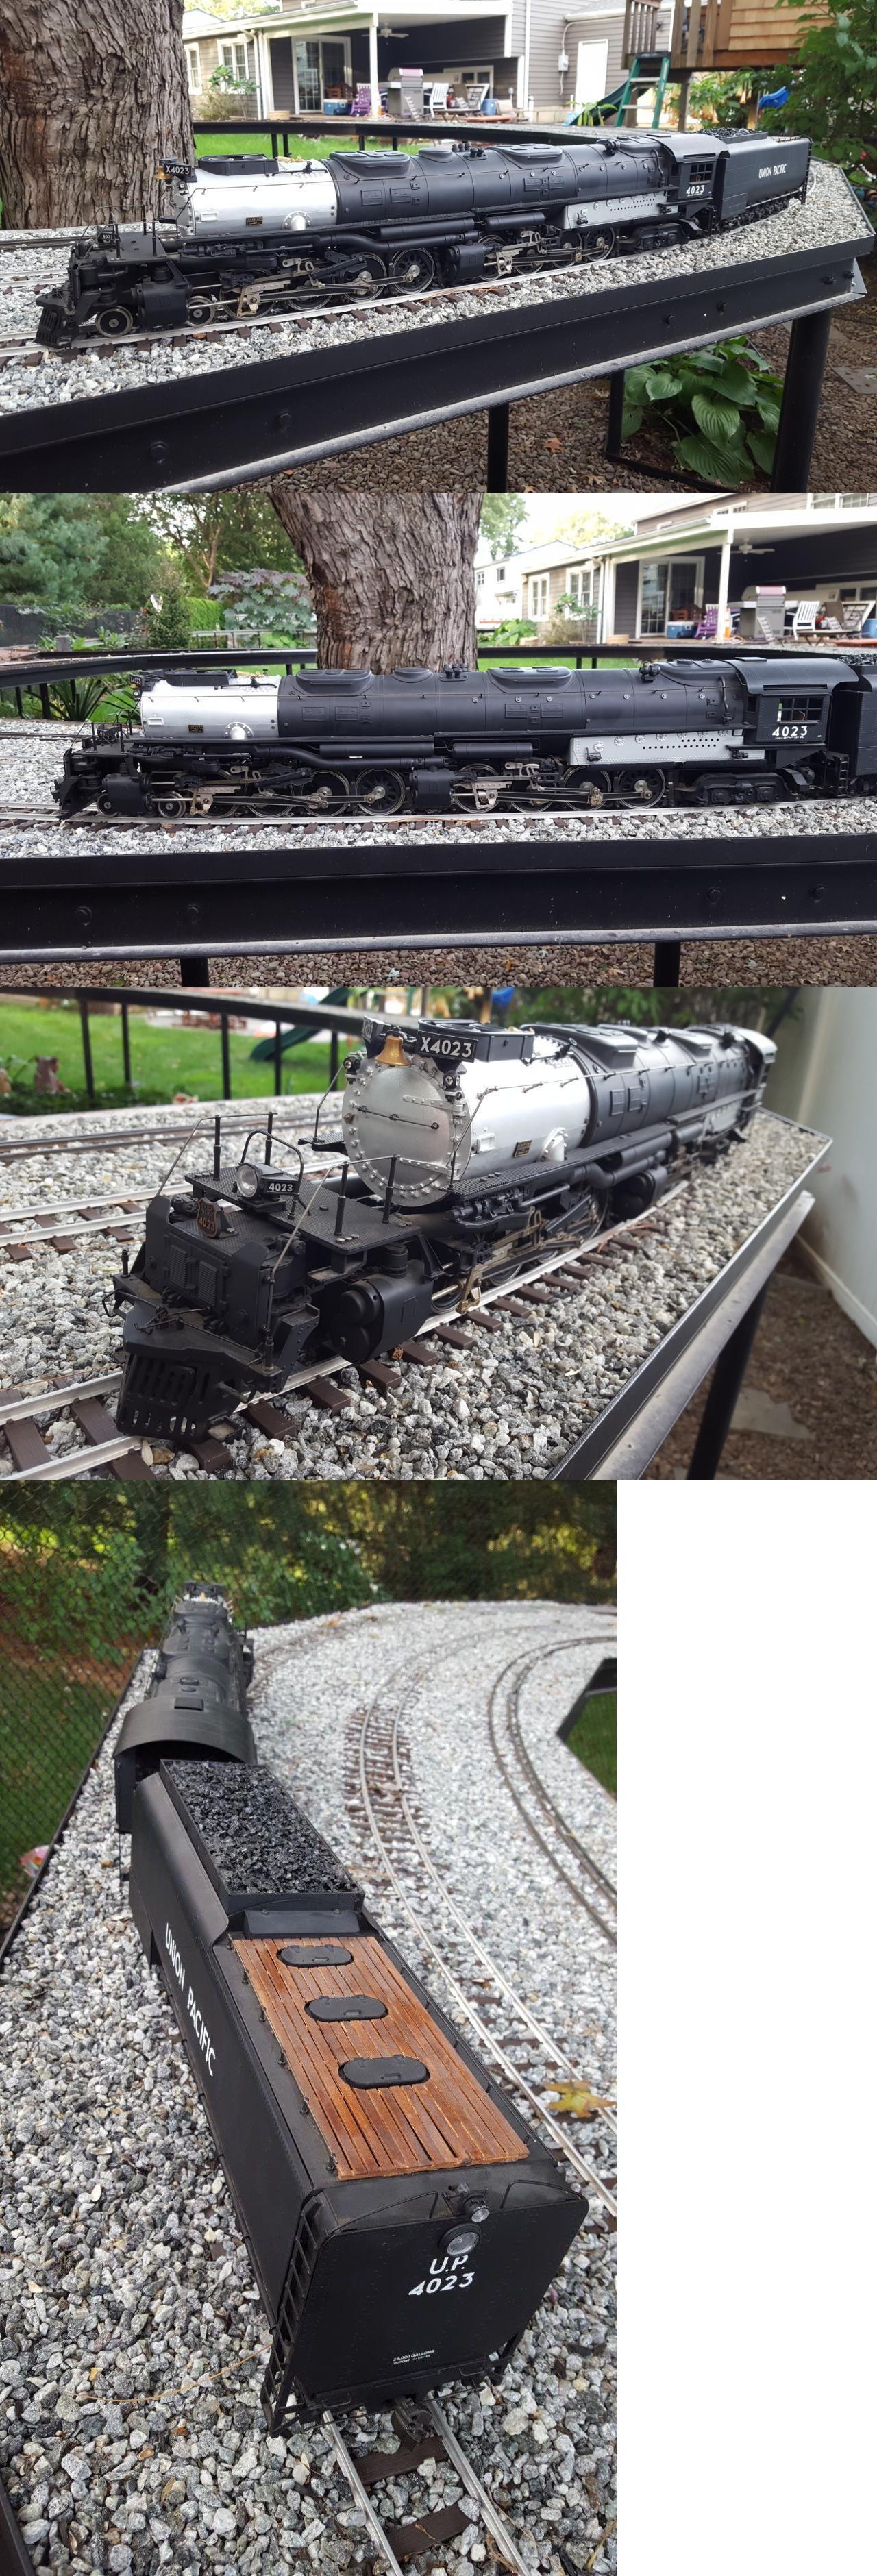 Locomotives 81012: Aster Bigboy 1 32 Gauge 1 Electric -> BUY